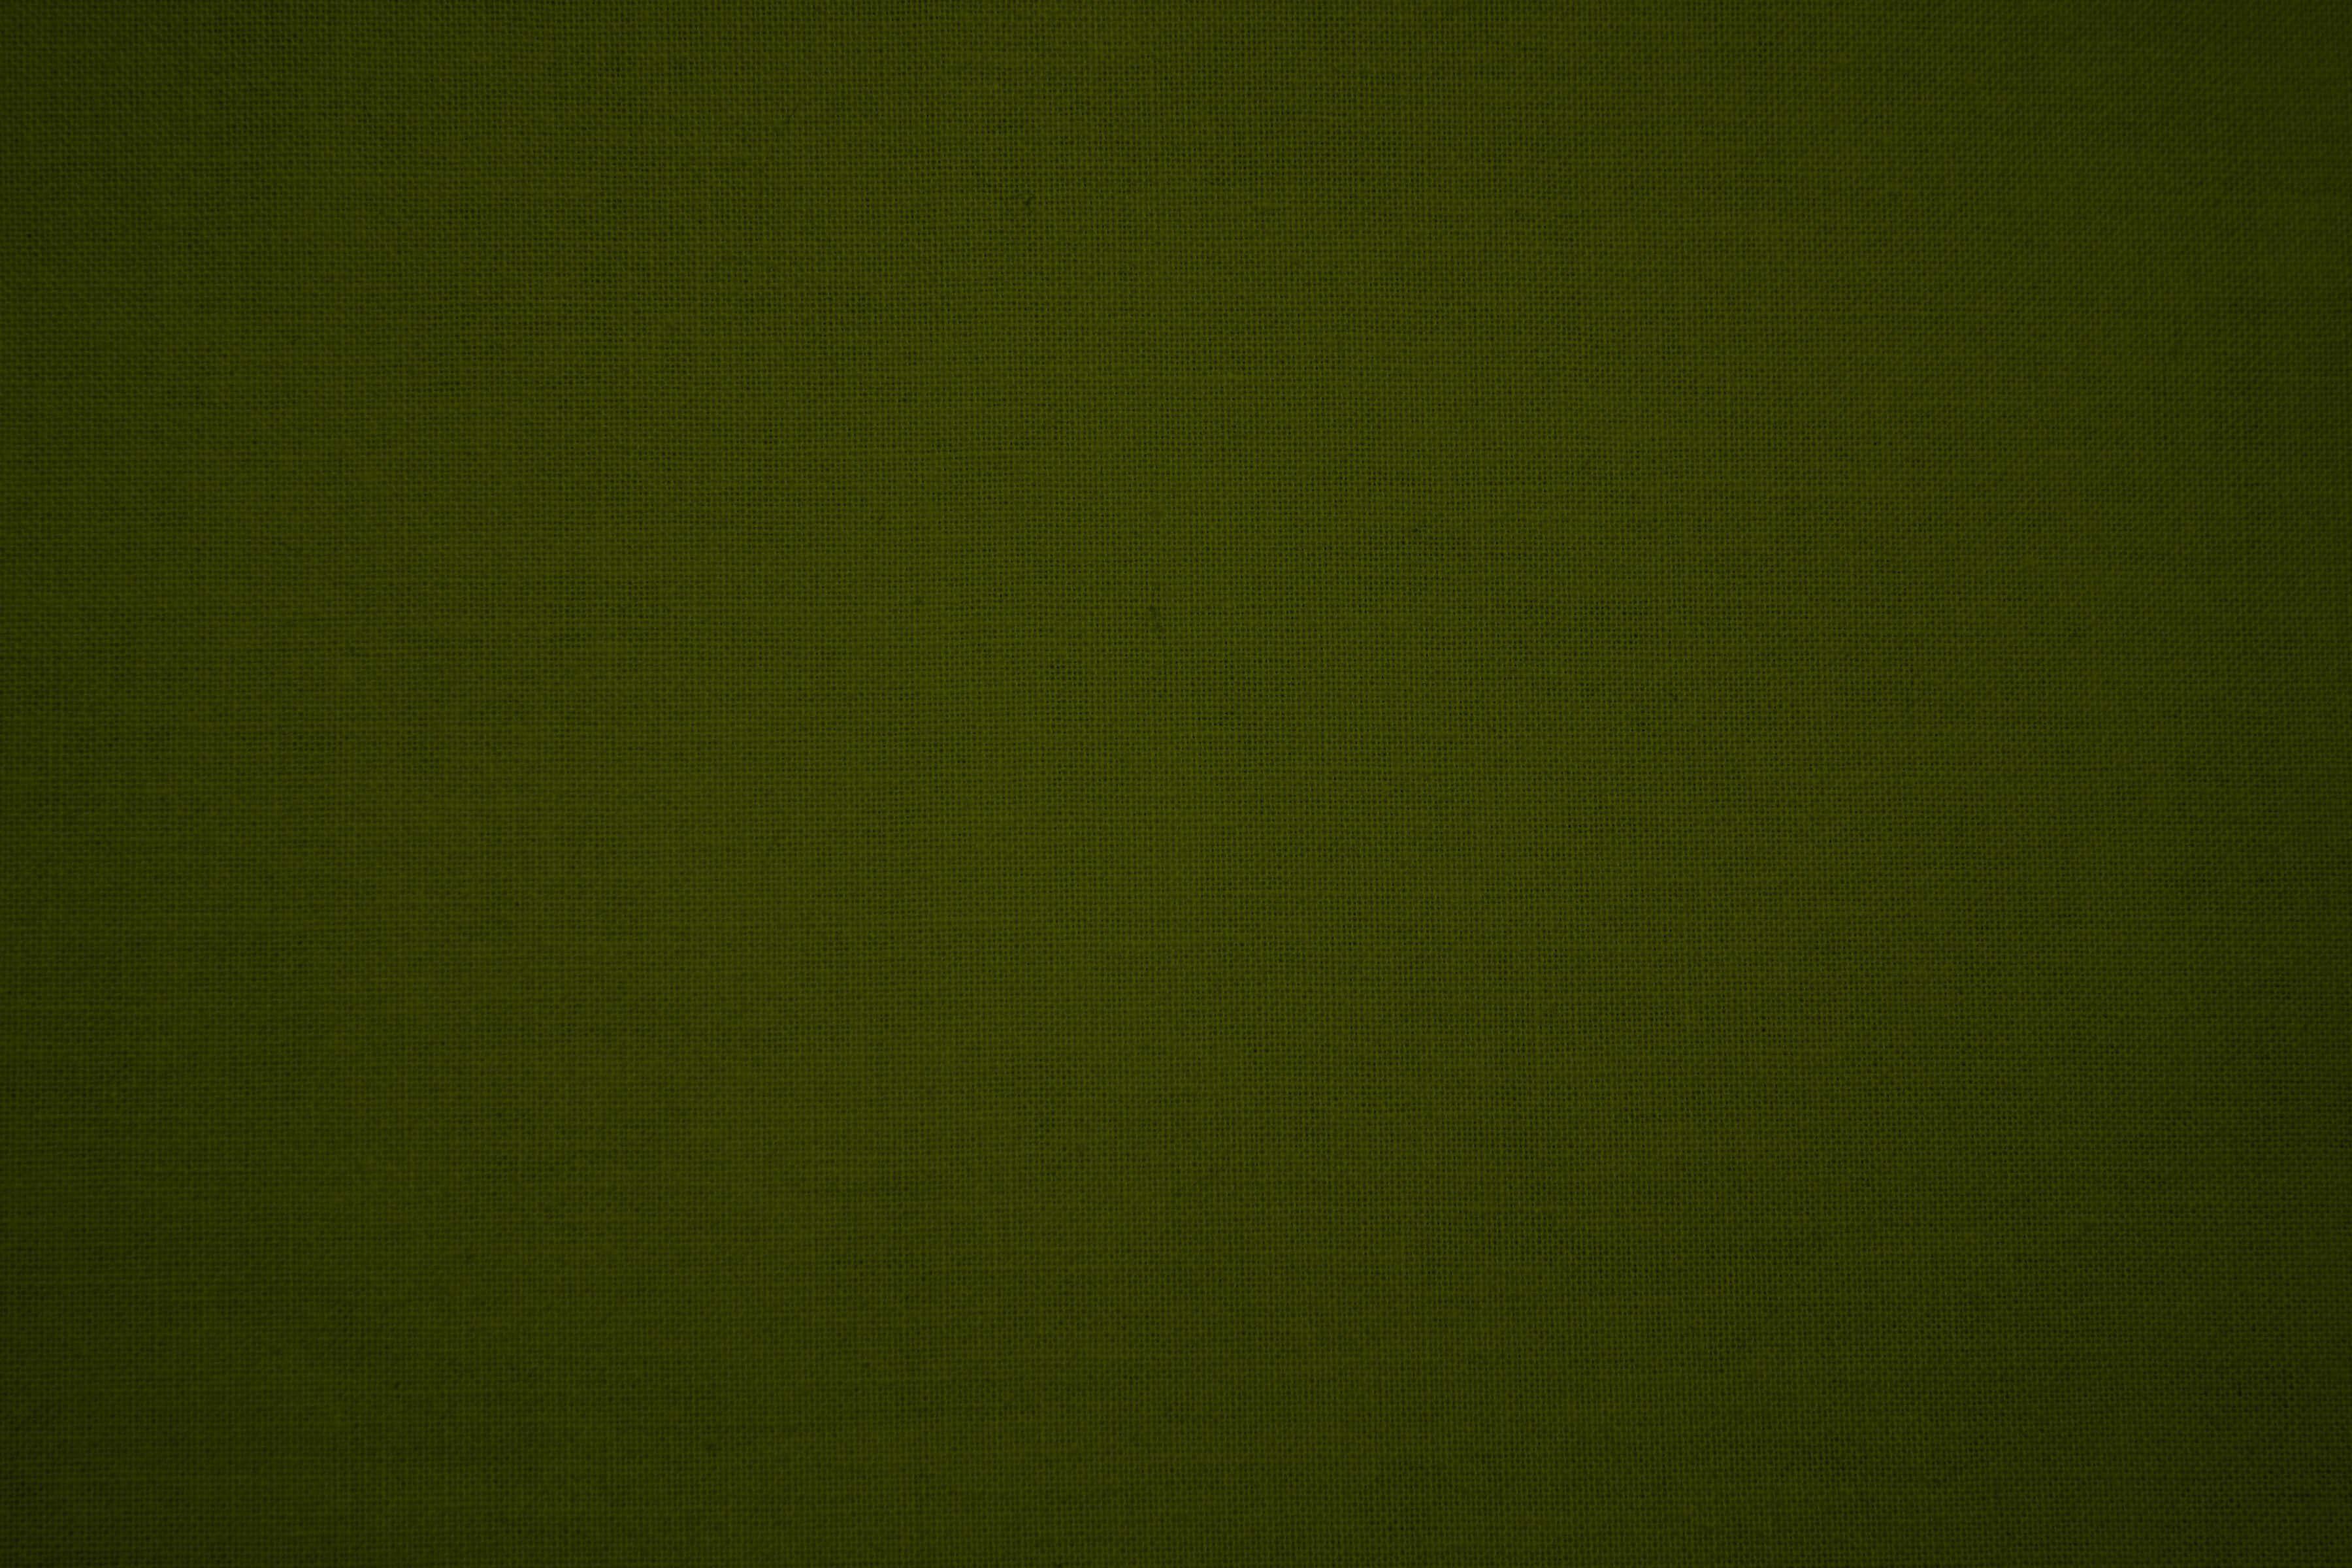 Image Gallery khaki green